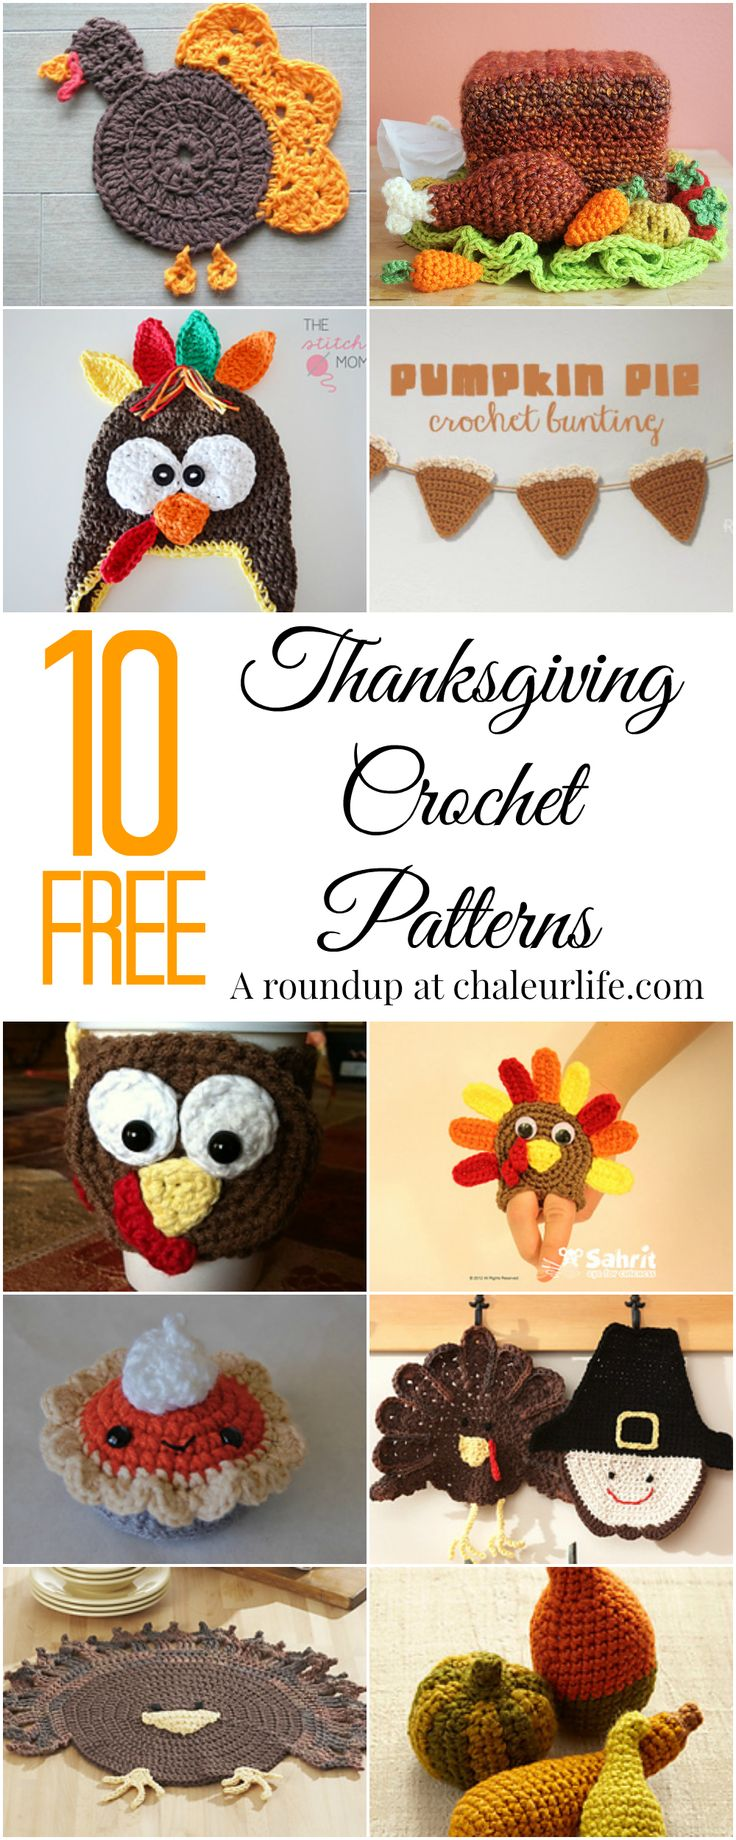 10 Free Thanksgiving Crochet Patterns | Chaleur Life